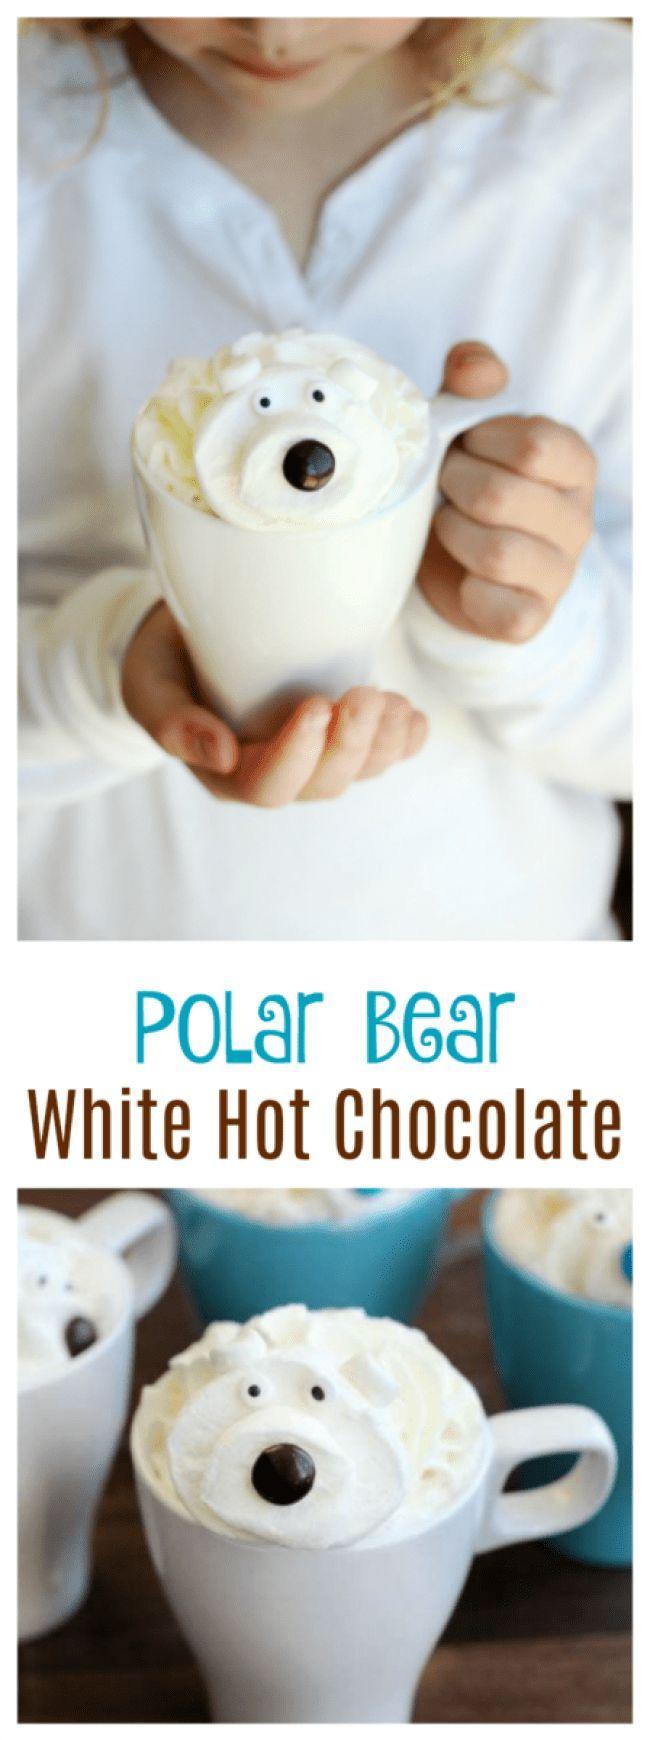 White Hot Chocolate Recipe With Polar Bear Marshmallows